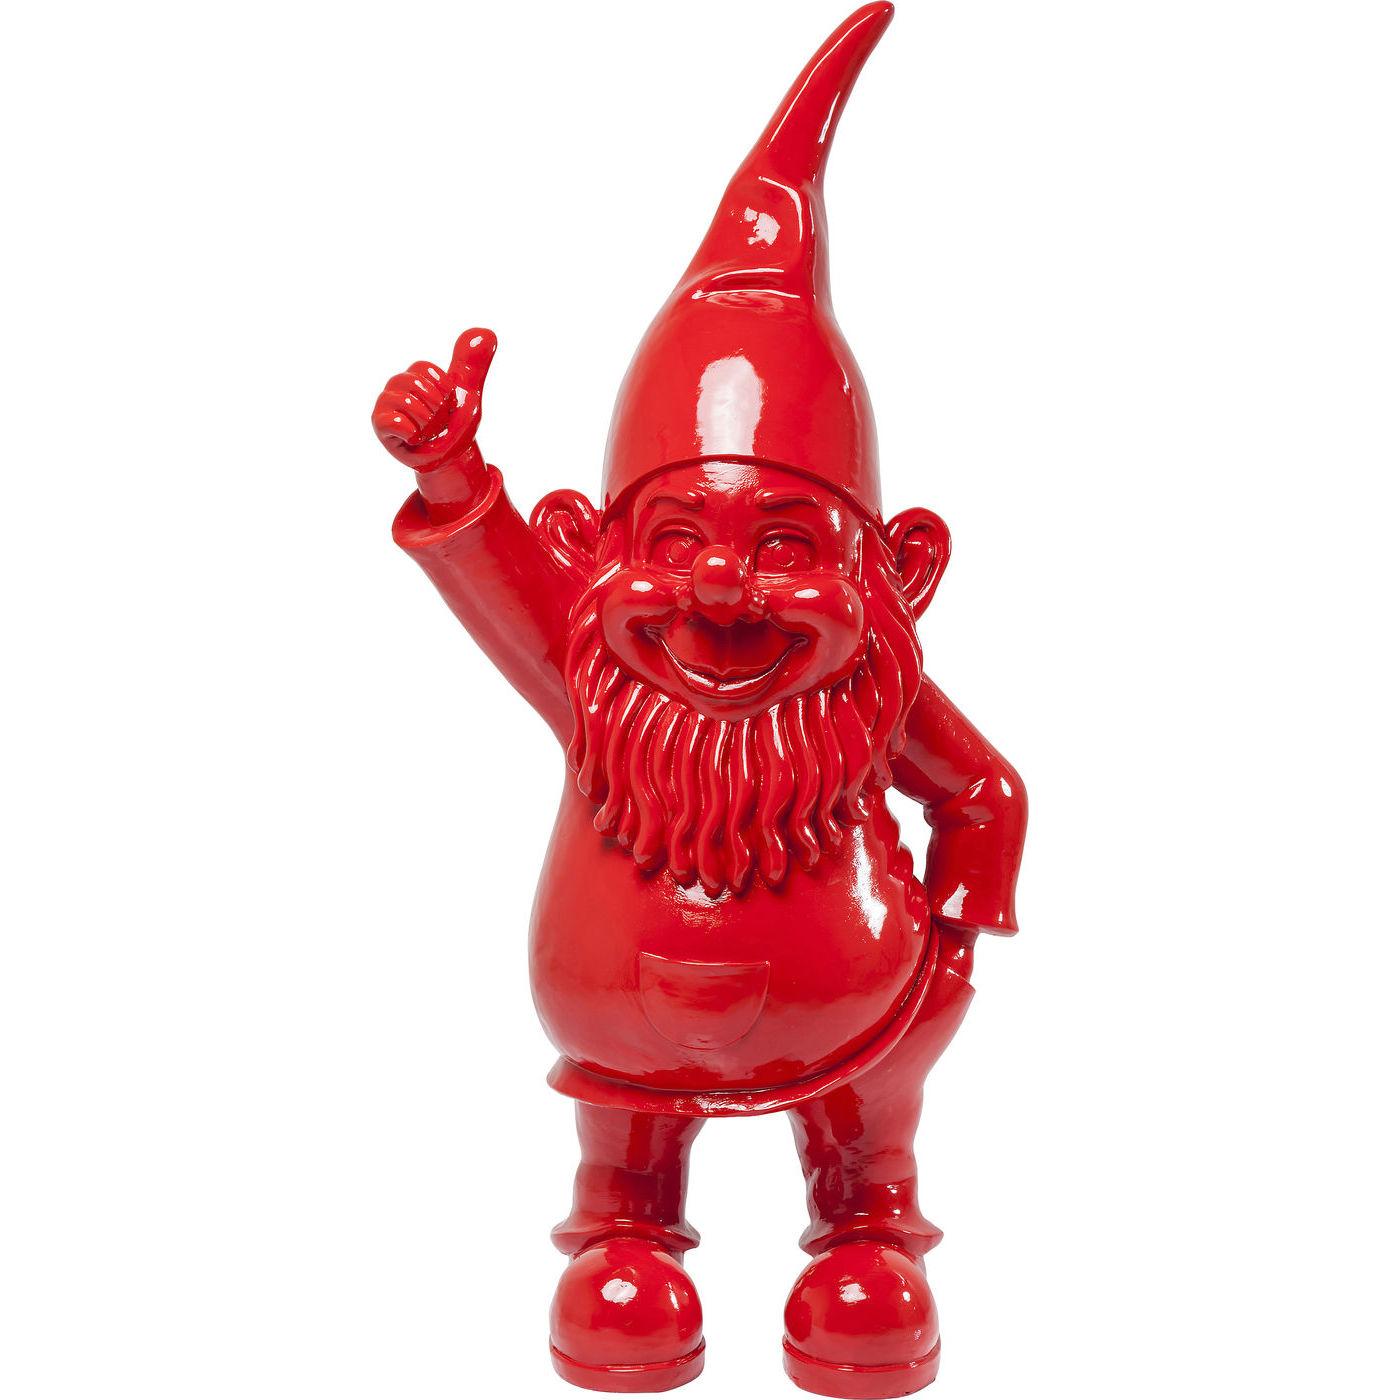 kare design – Kare design skulptur, zwerg red - rød polyresin, (152x53cm) på boboonline.dk